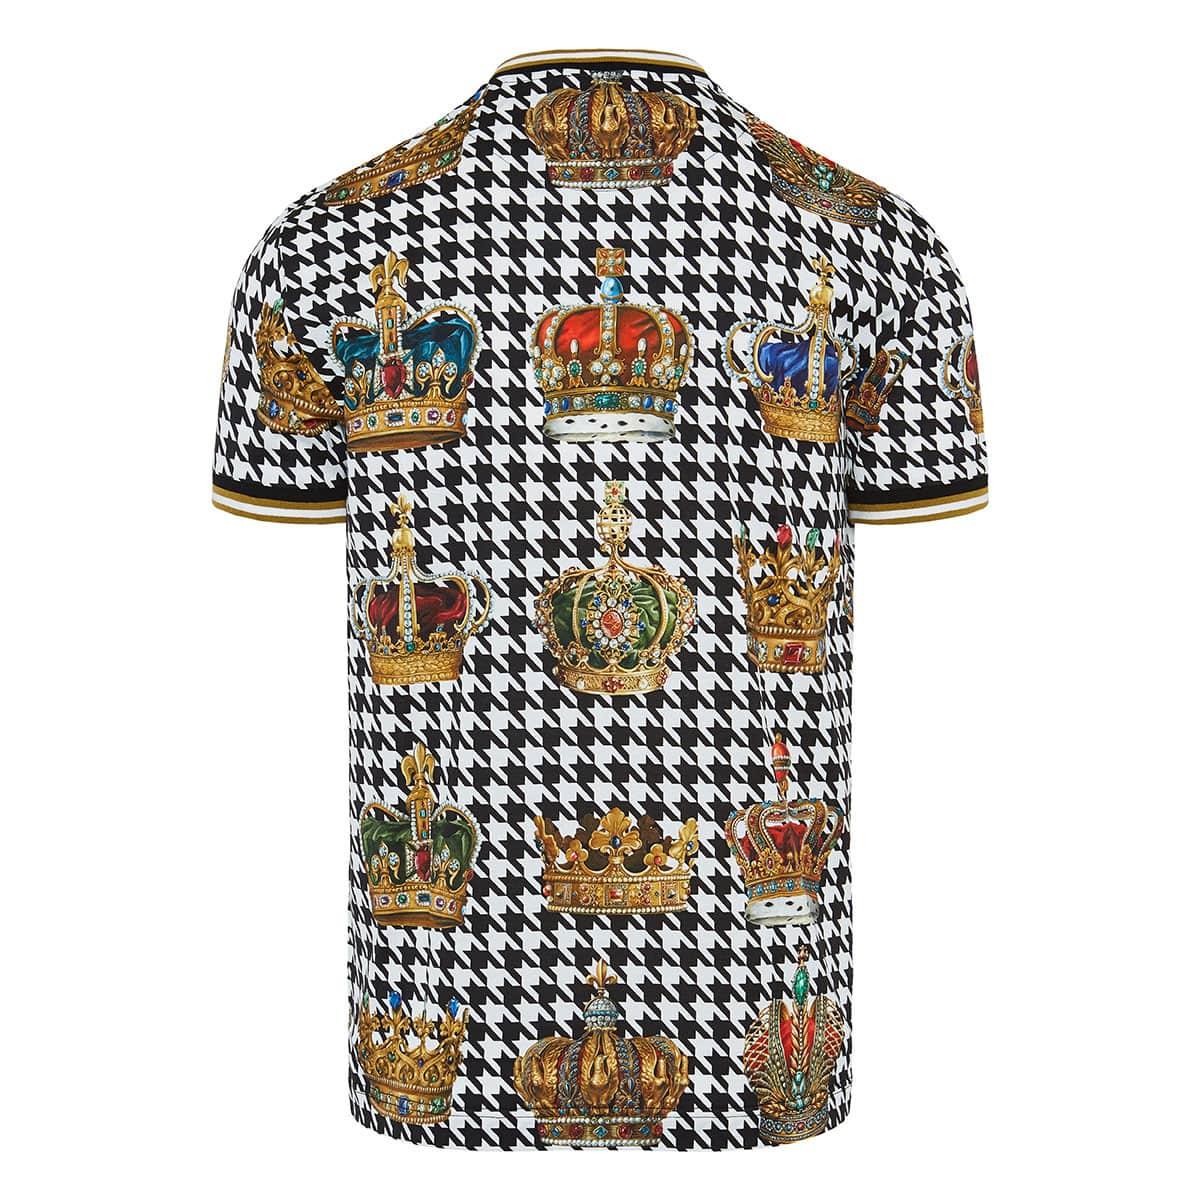 Herringbone crown printed t-shirt